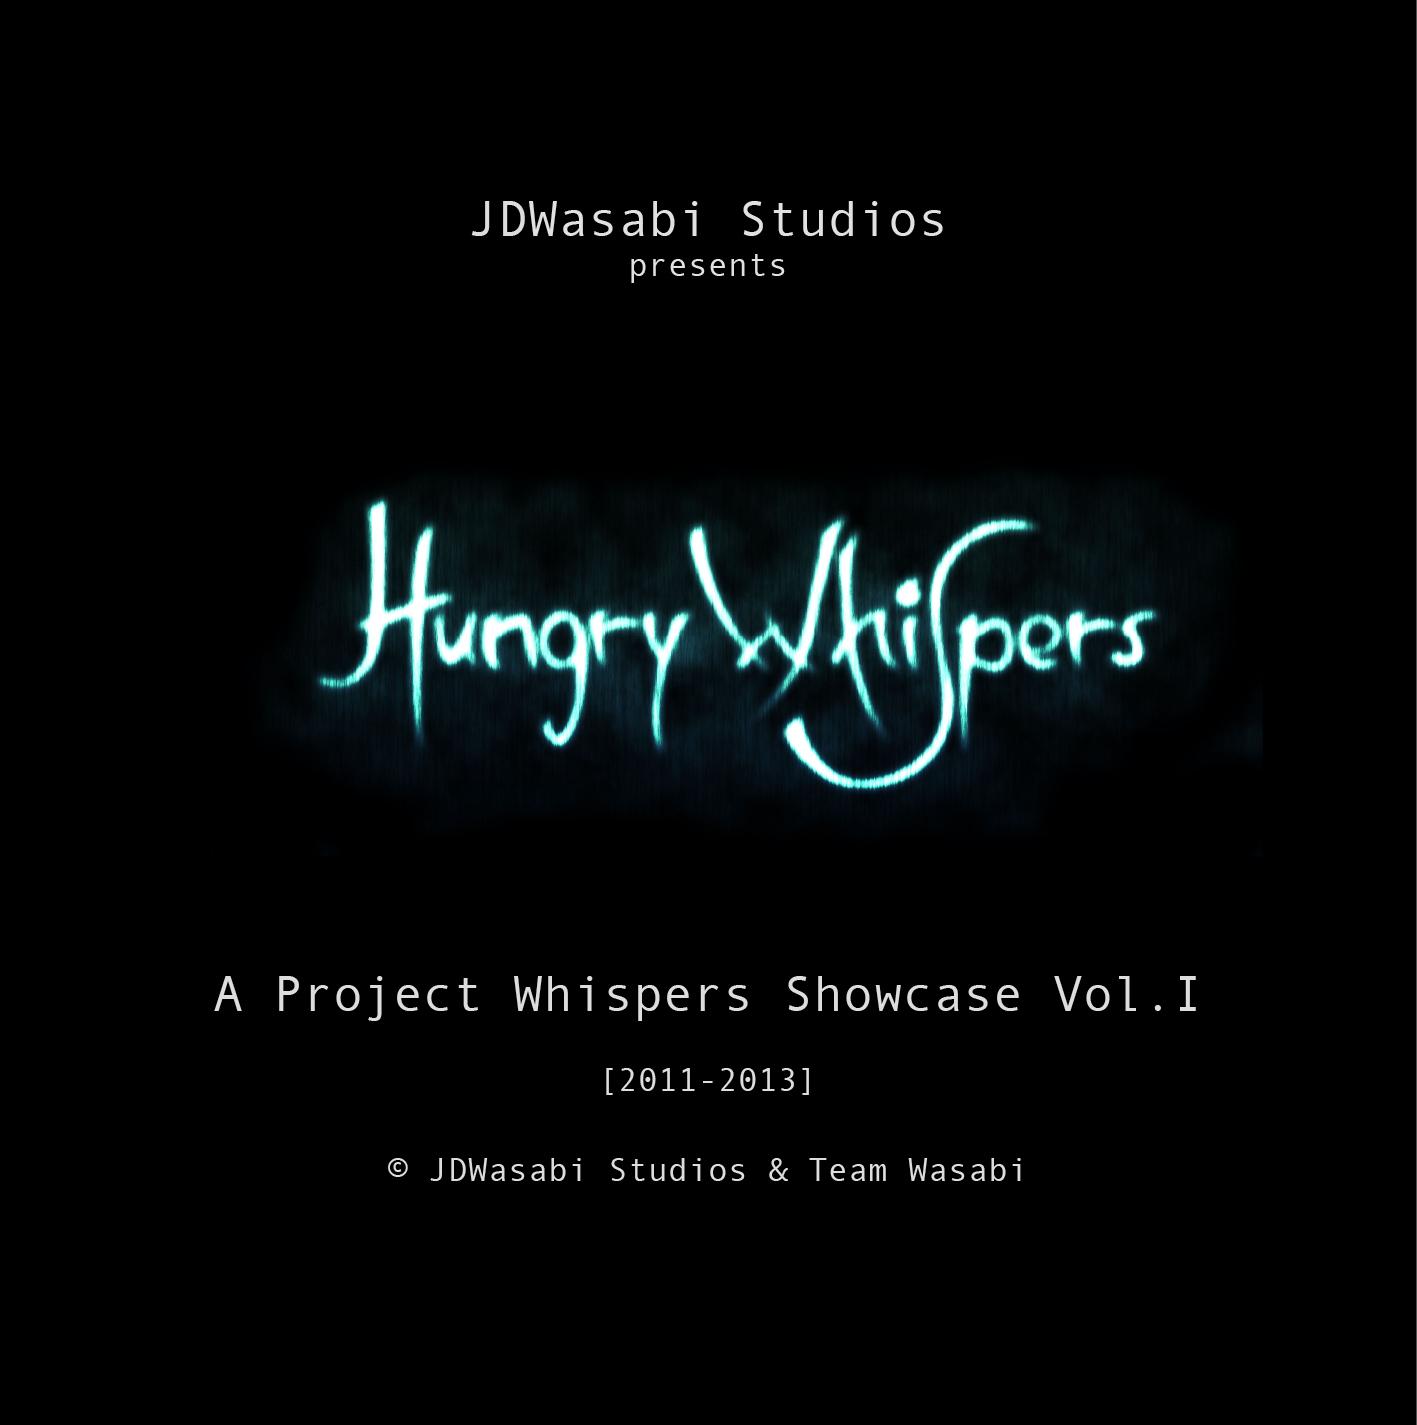 Project Whispers Digital Artbook Vol.1 by JDWasabi